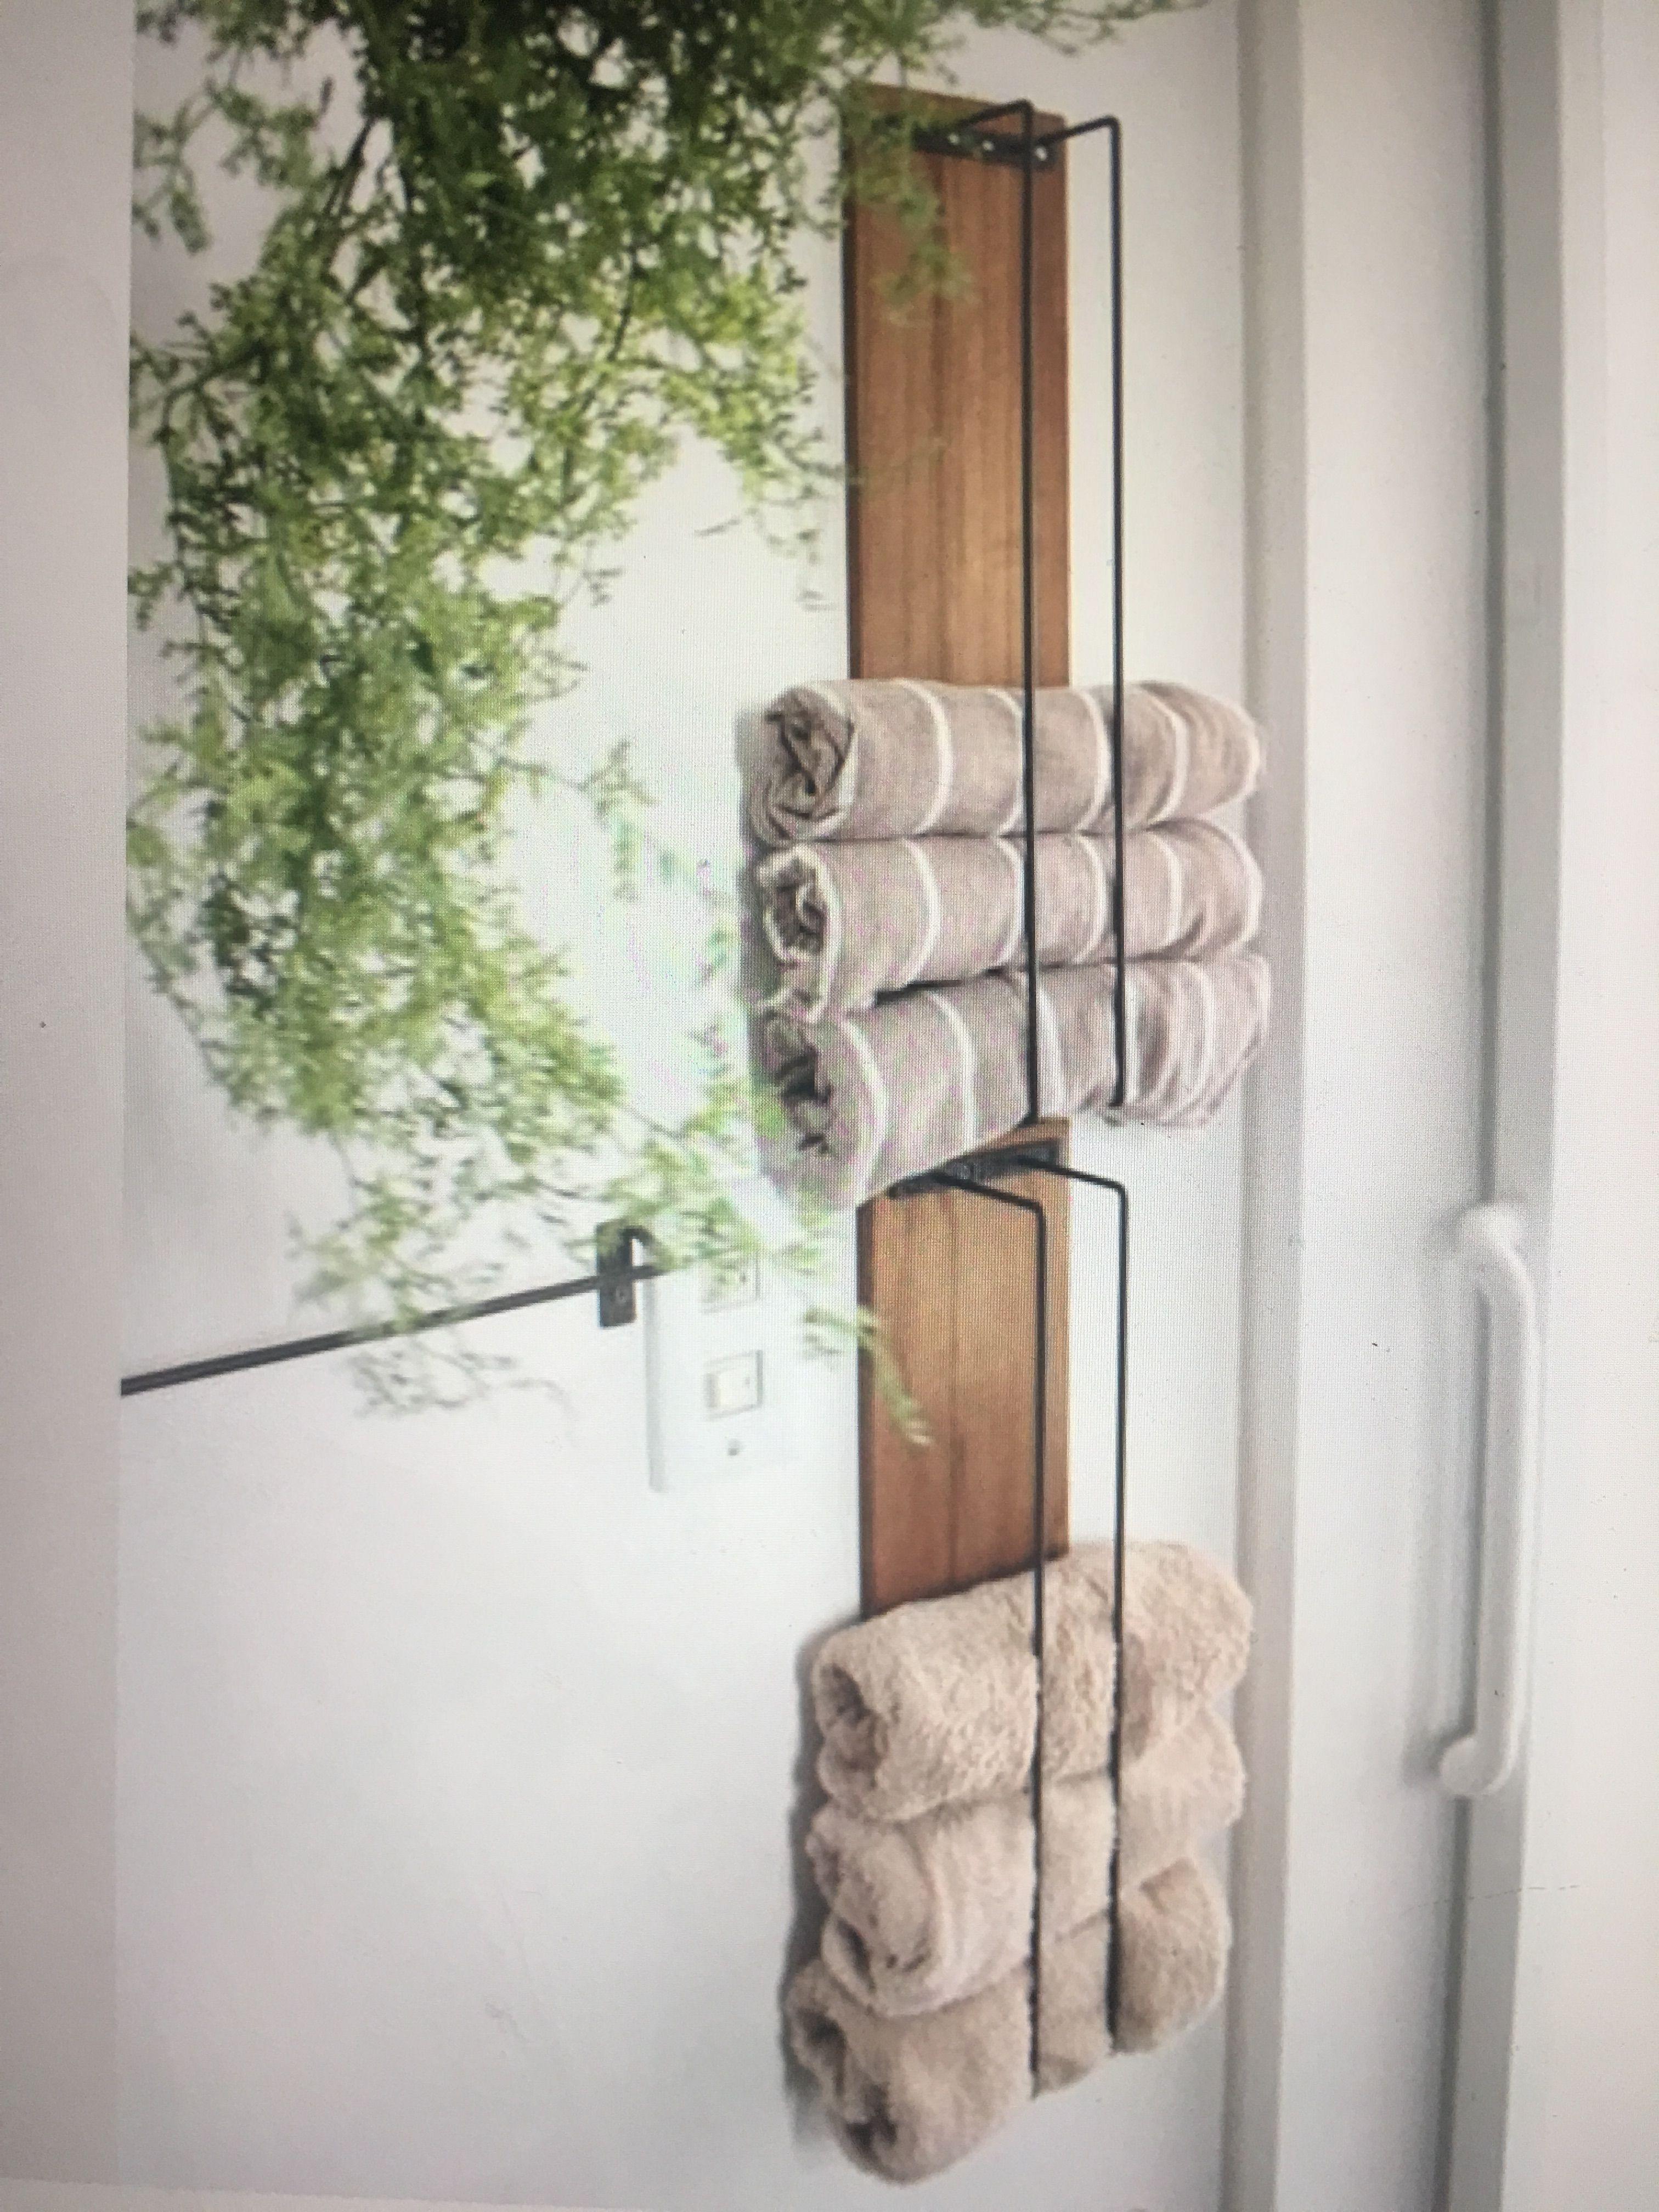 Small Bath Towel Storage A Little More Farmhouse Chic But I Like